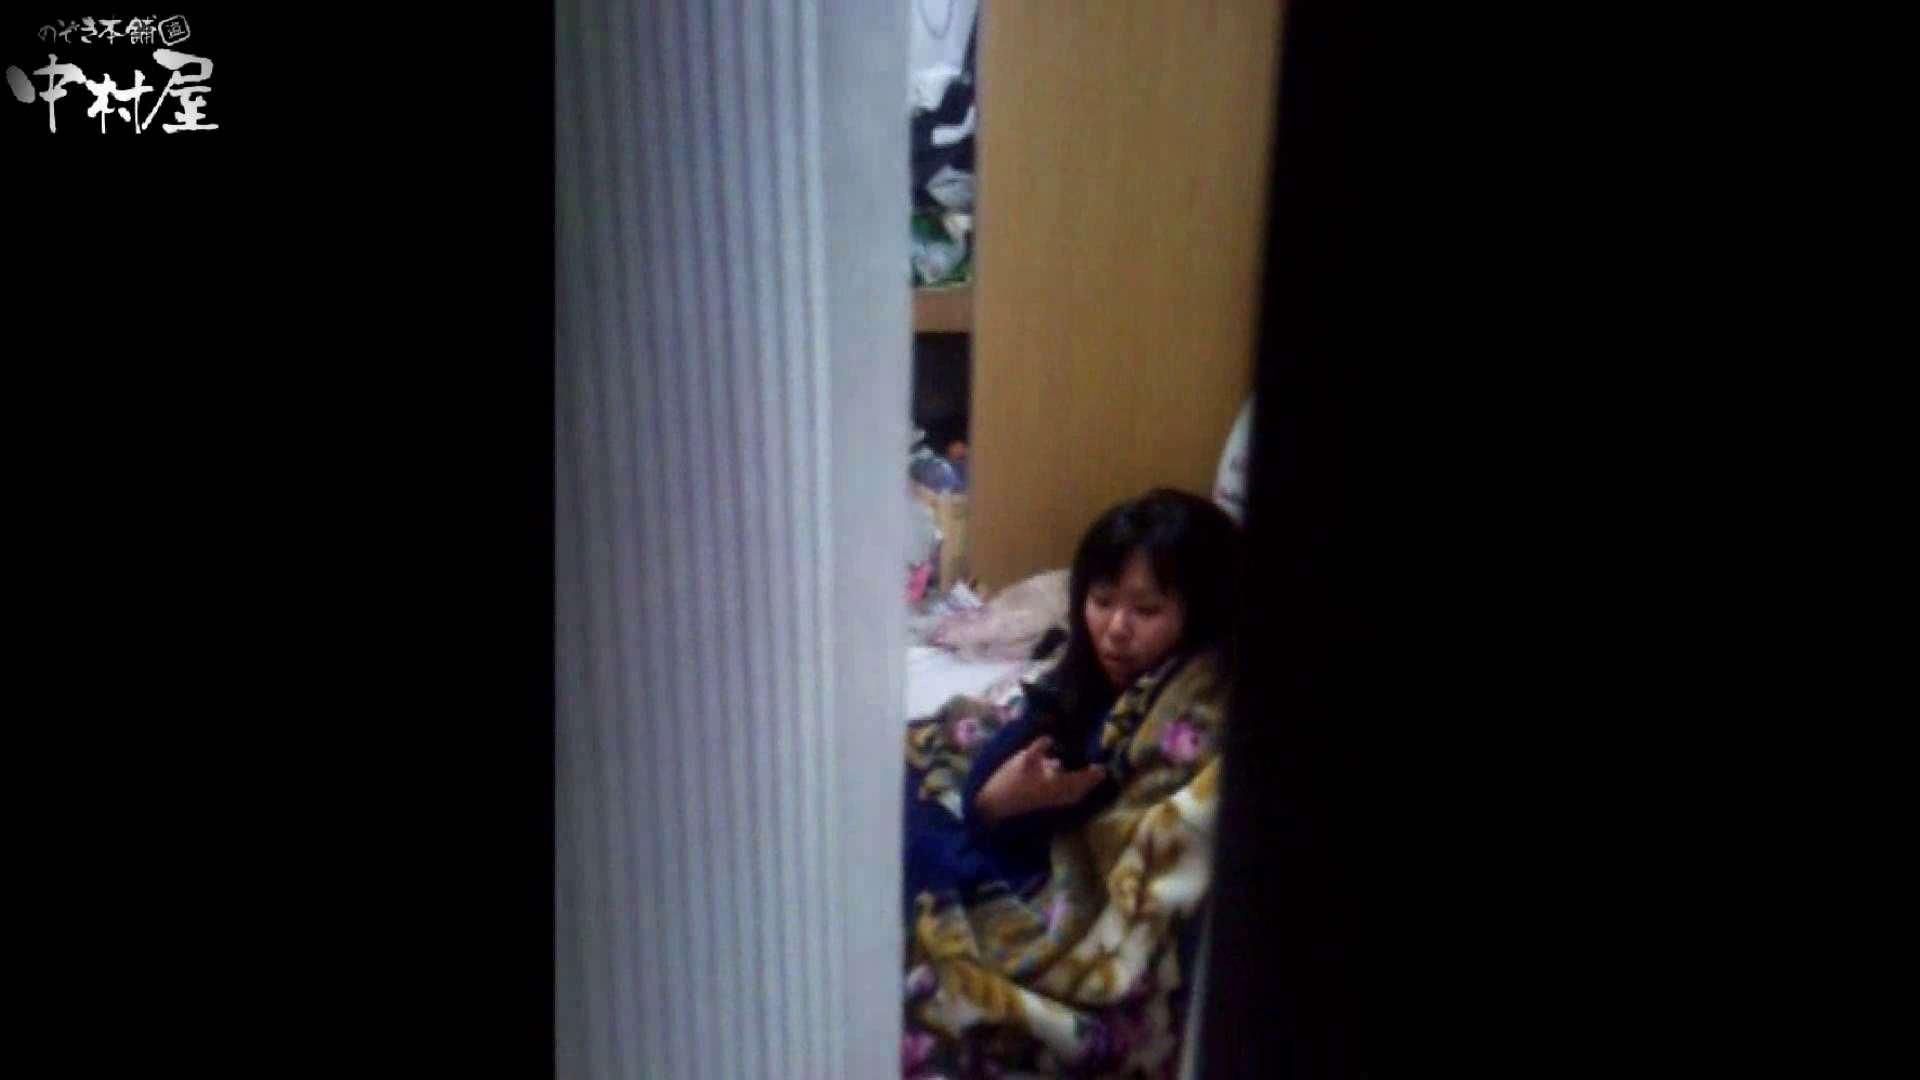 民家風呂専門盗撮師の超危険映像 vol.012 盗撮動画 | エロい美女  11枚 11